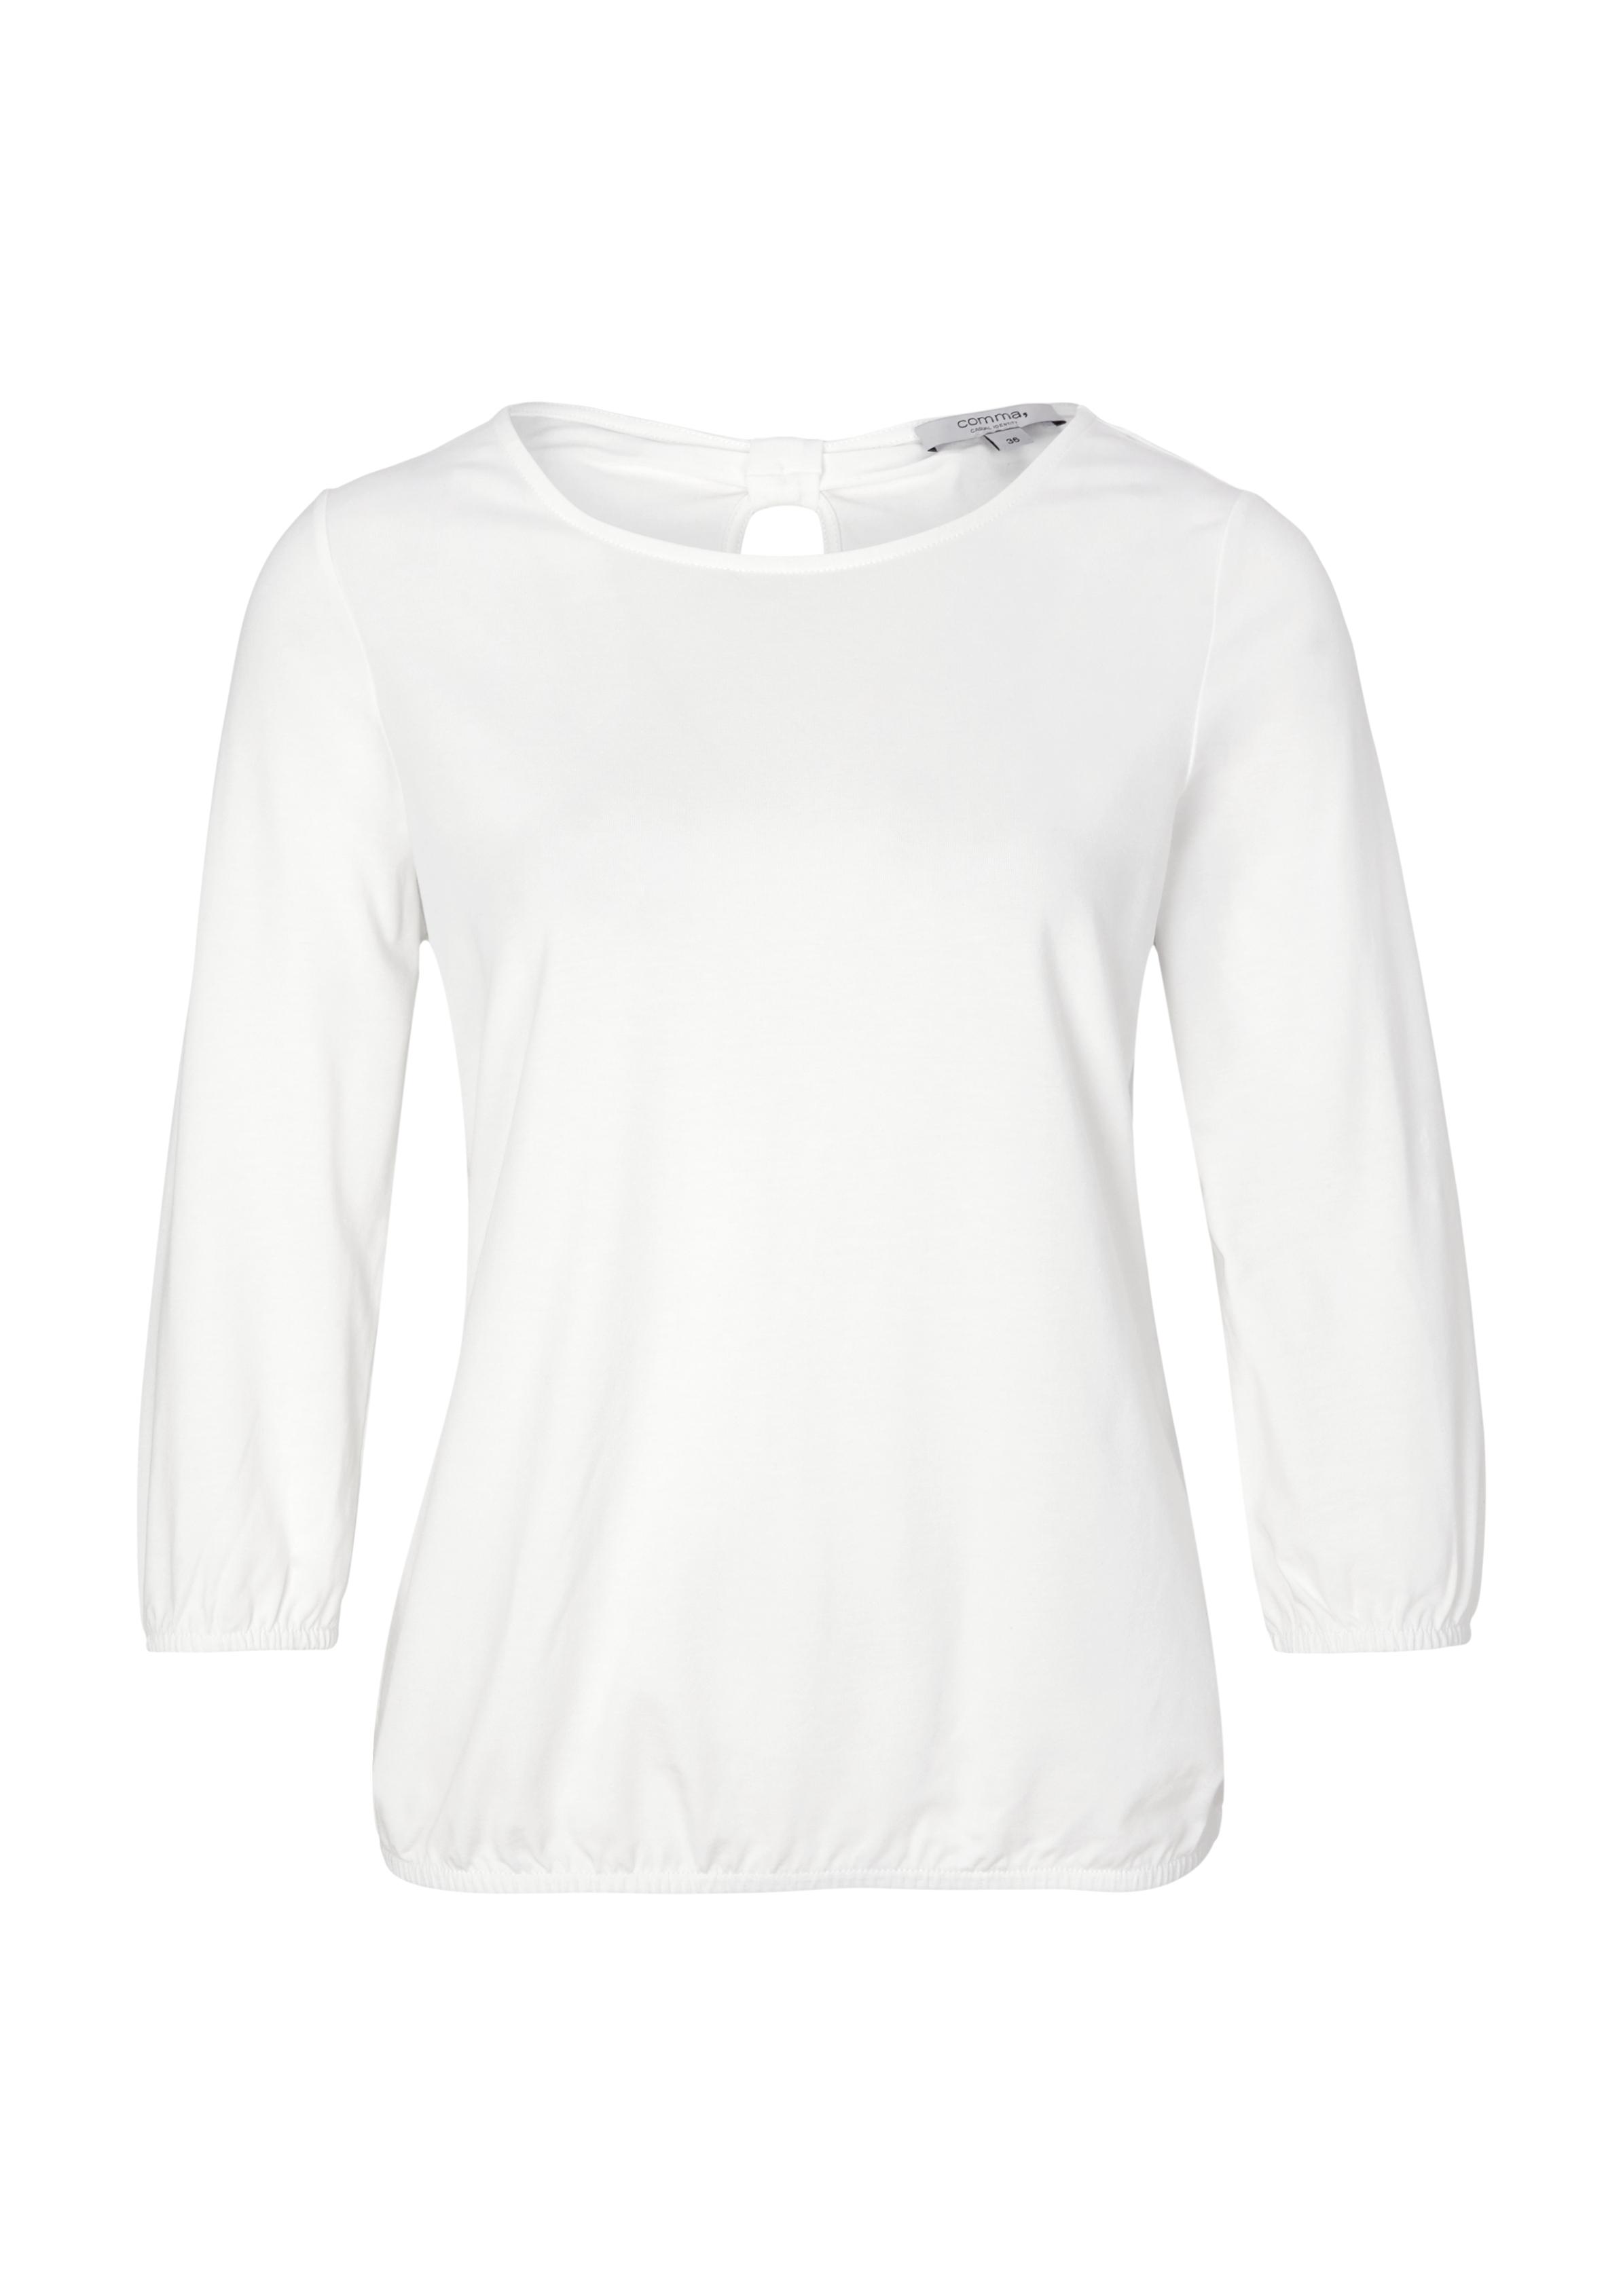 3/4-Arm Shirt | Bekleidung > Shirts > Sonstige Shirts | Weiß | 46% modal -  46% baumwolle -  8% elasthan | comma